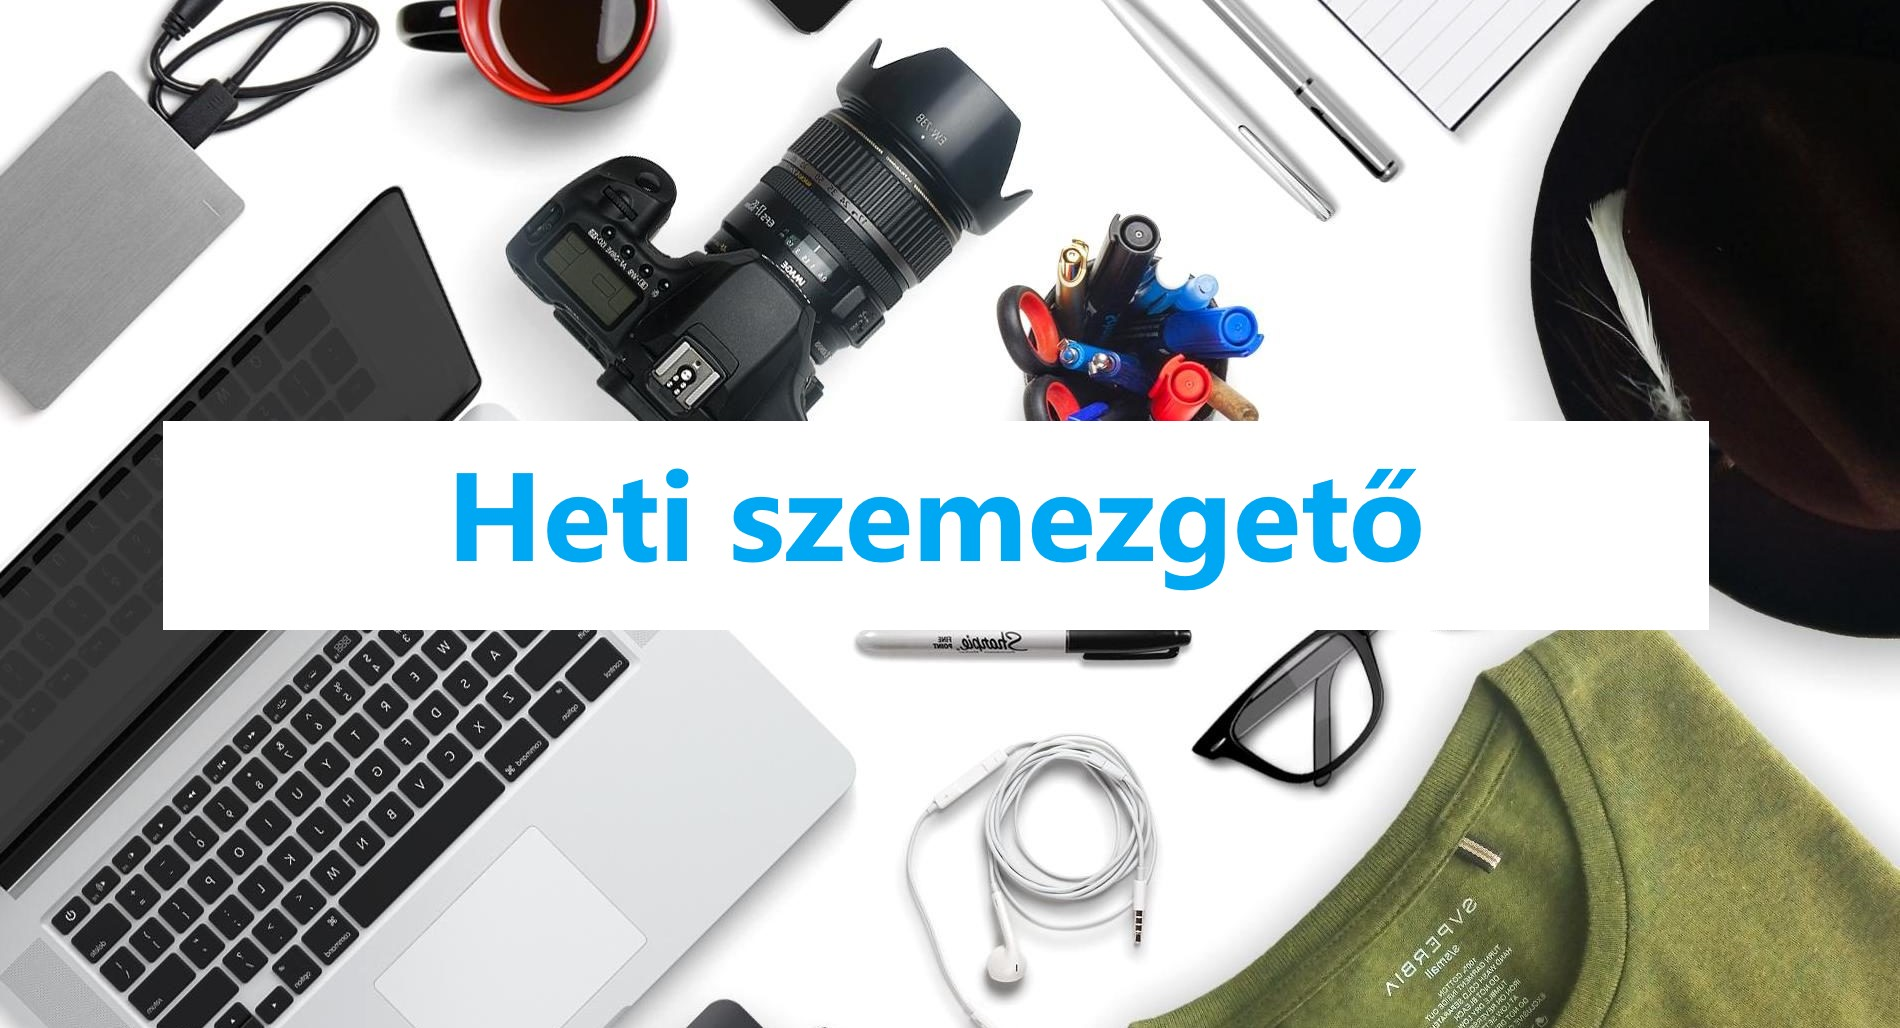 heti_szemezgeto_uj_119.jpg